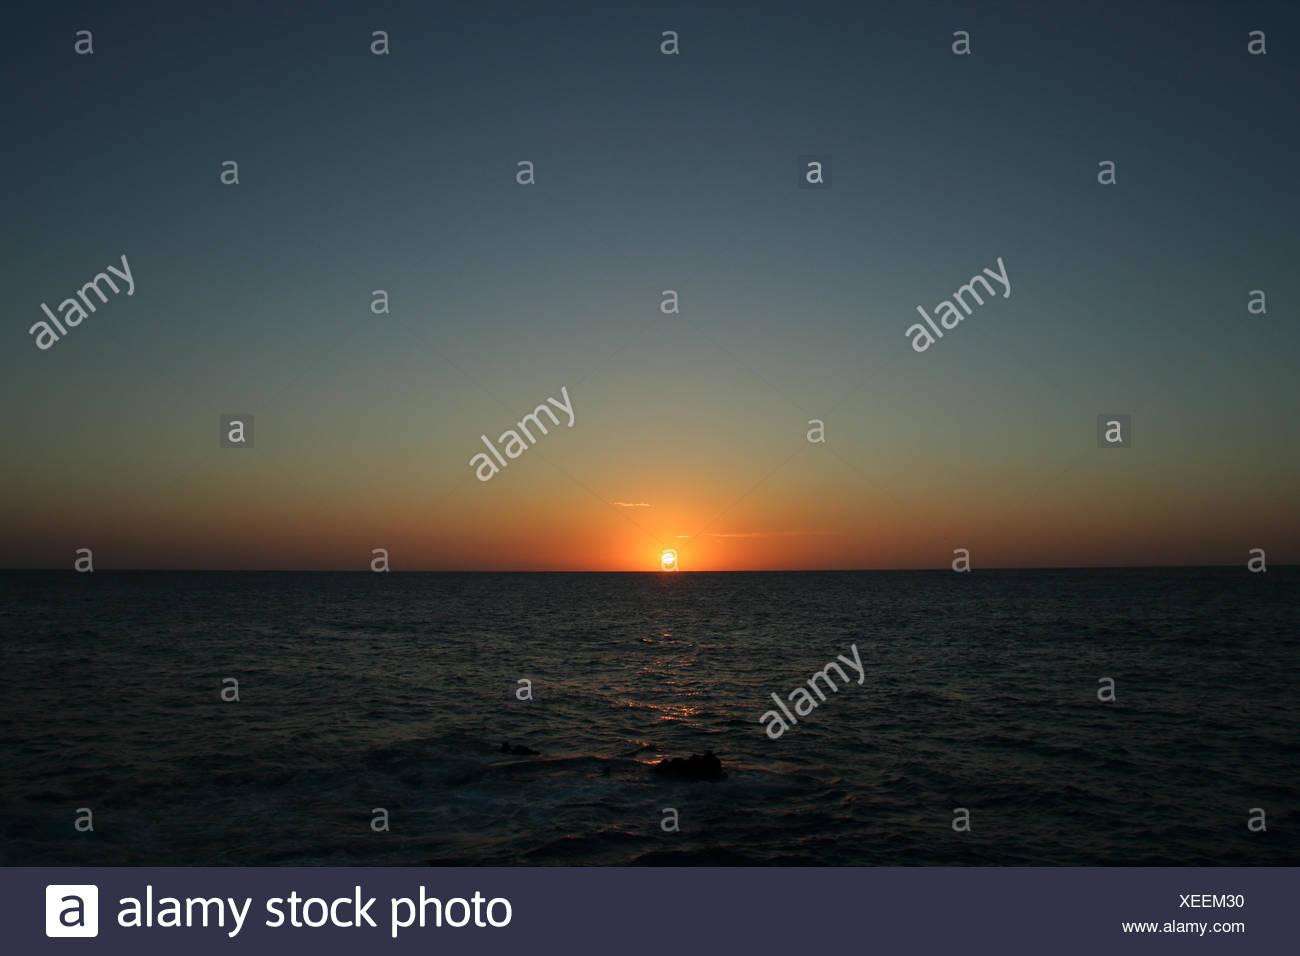 Sunset over ocean, Japan - Stock Image